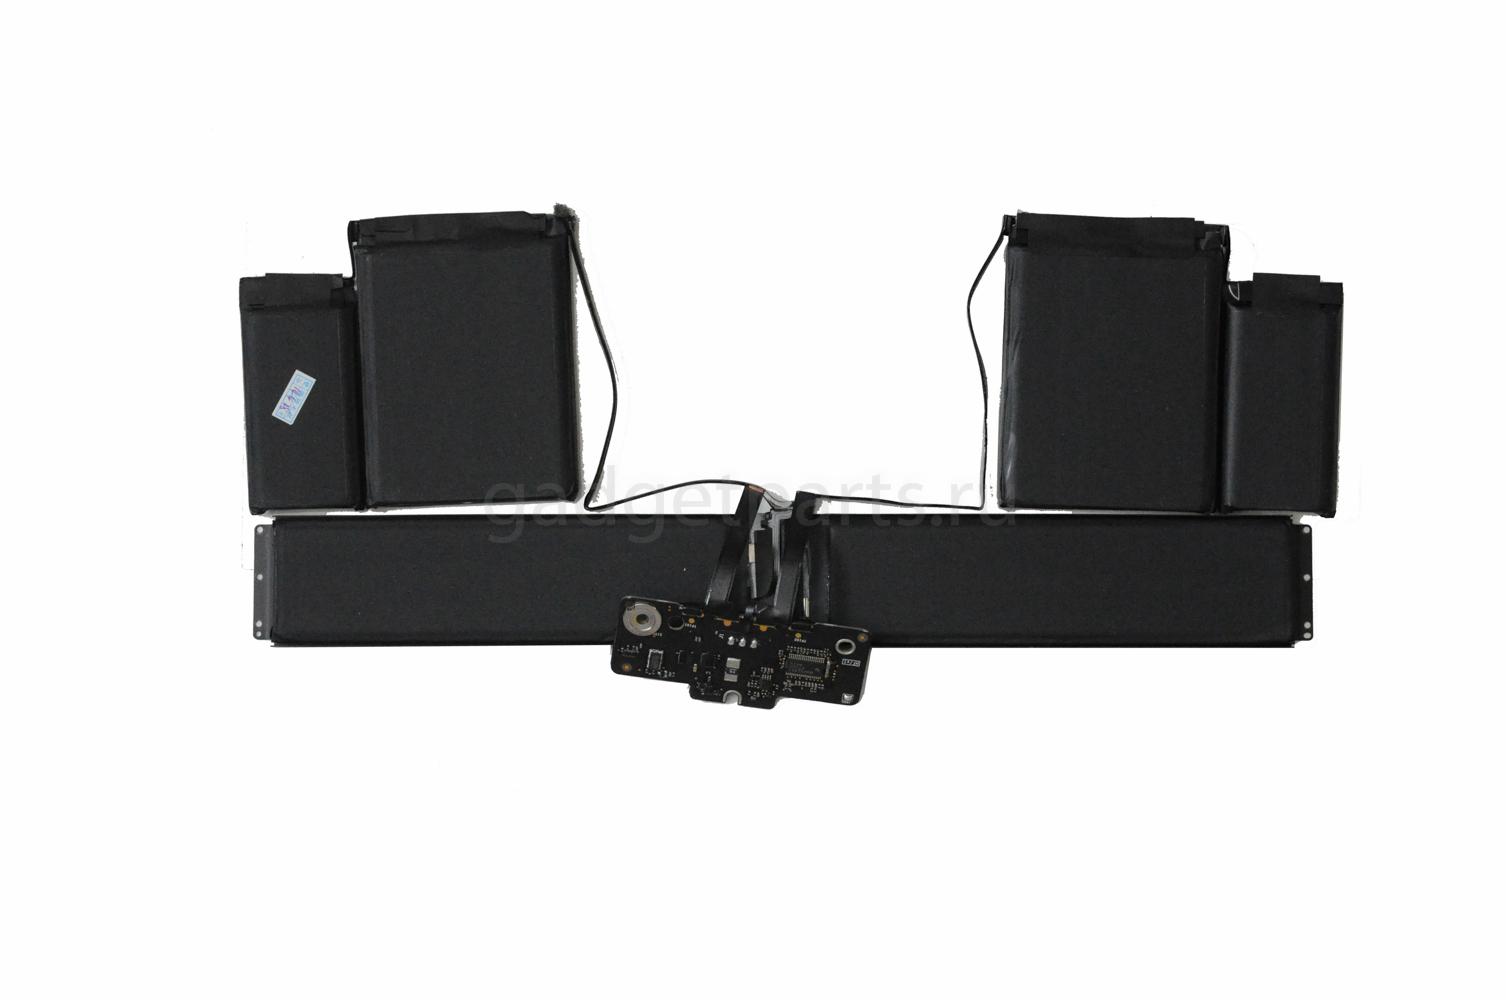 Аккумулятор MacBook Pro Retina 13 A1425 2012 год